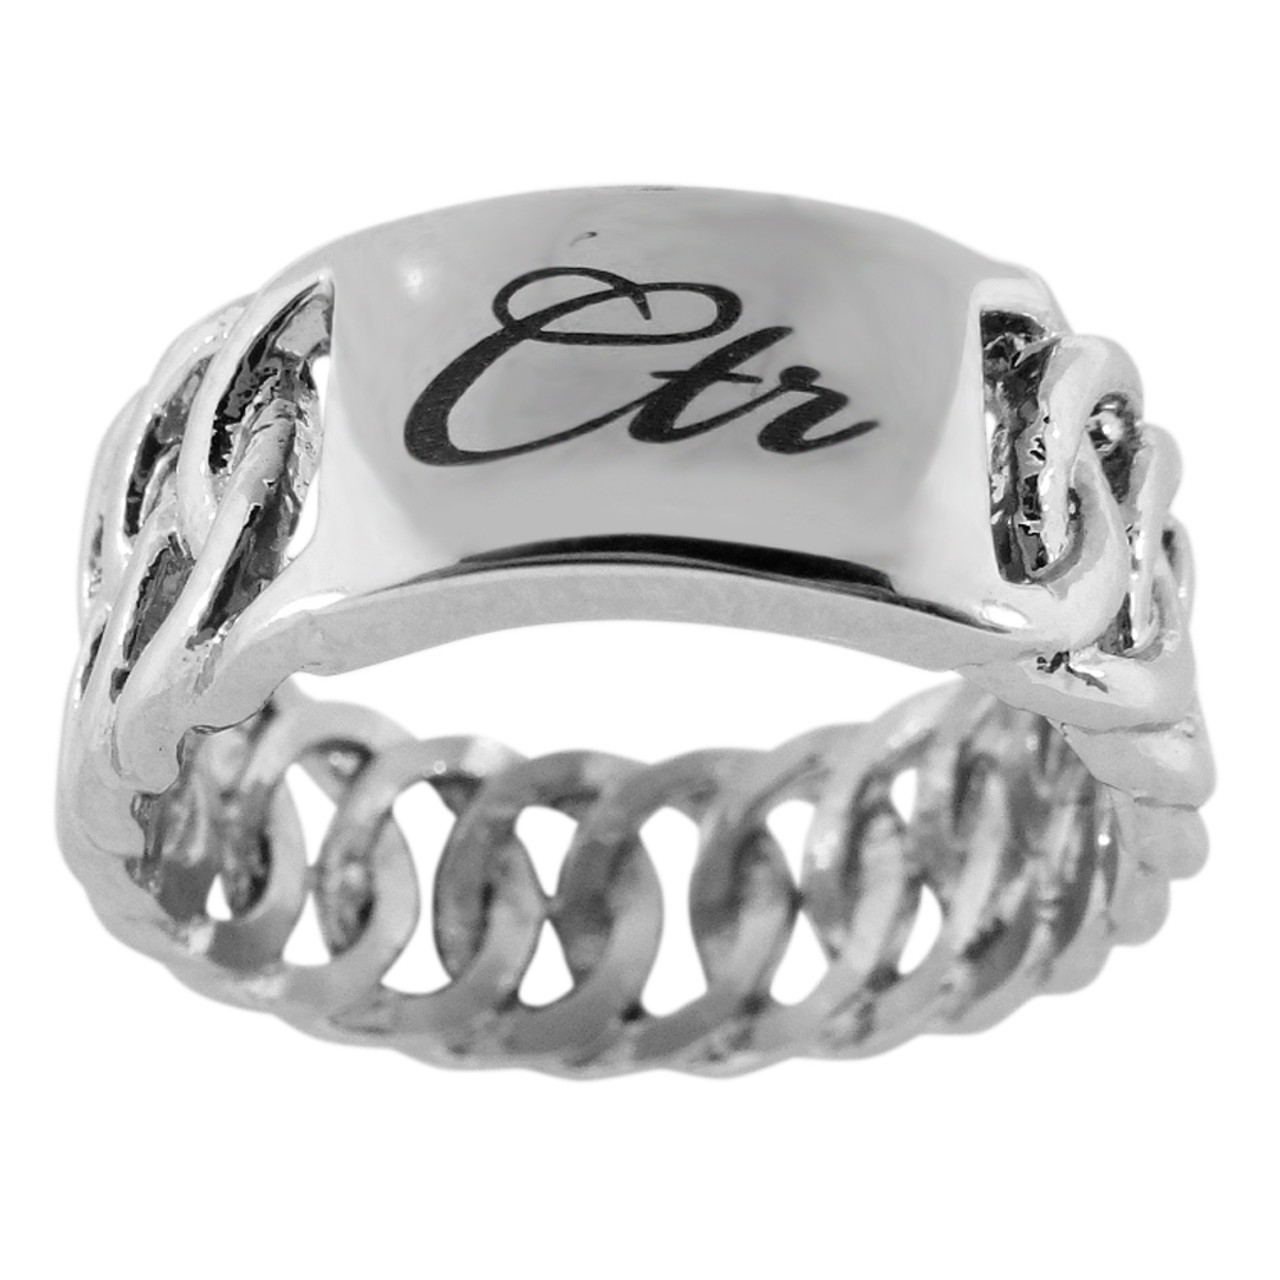 Braid CTR Ring (Stainless Steel)  *